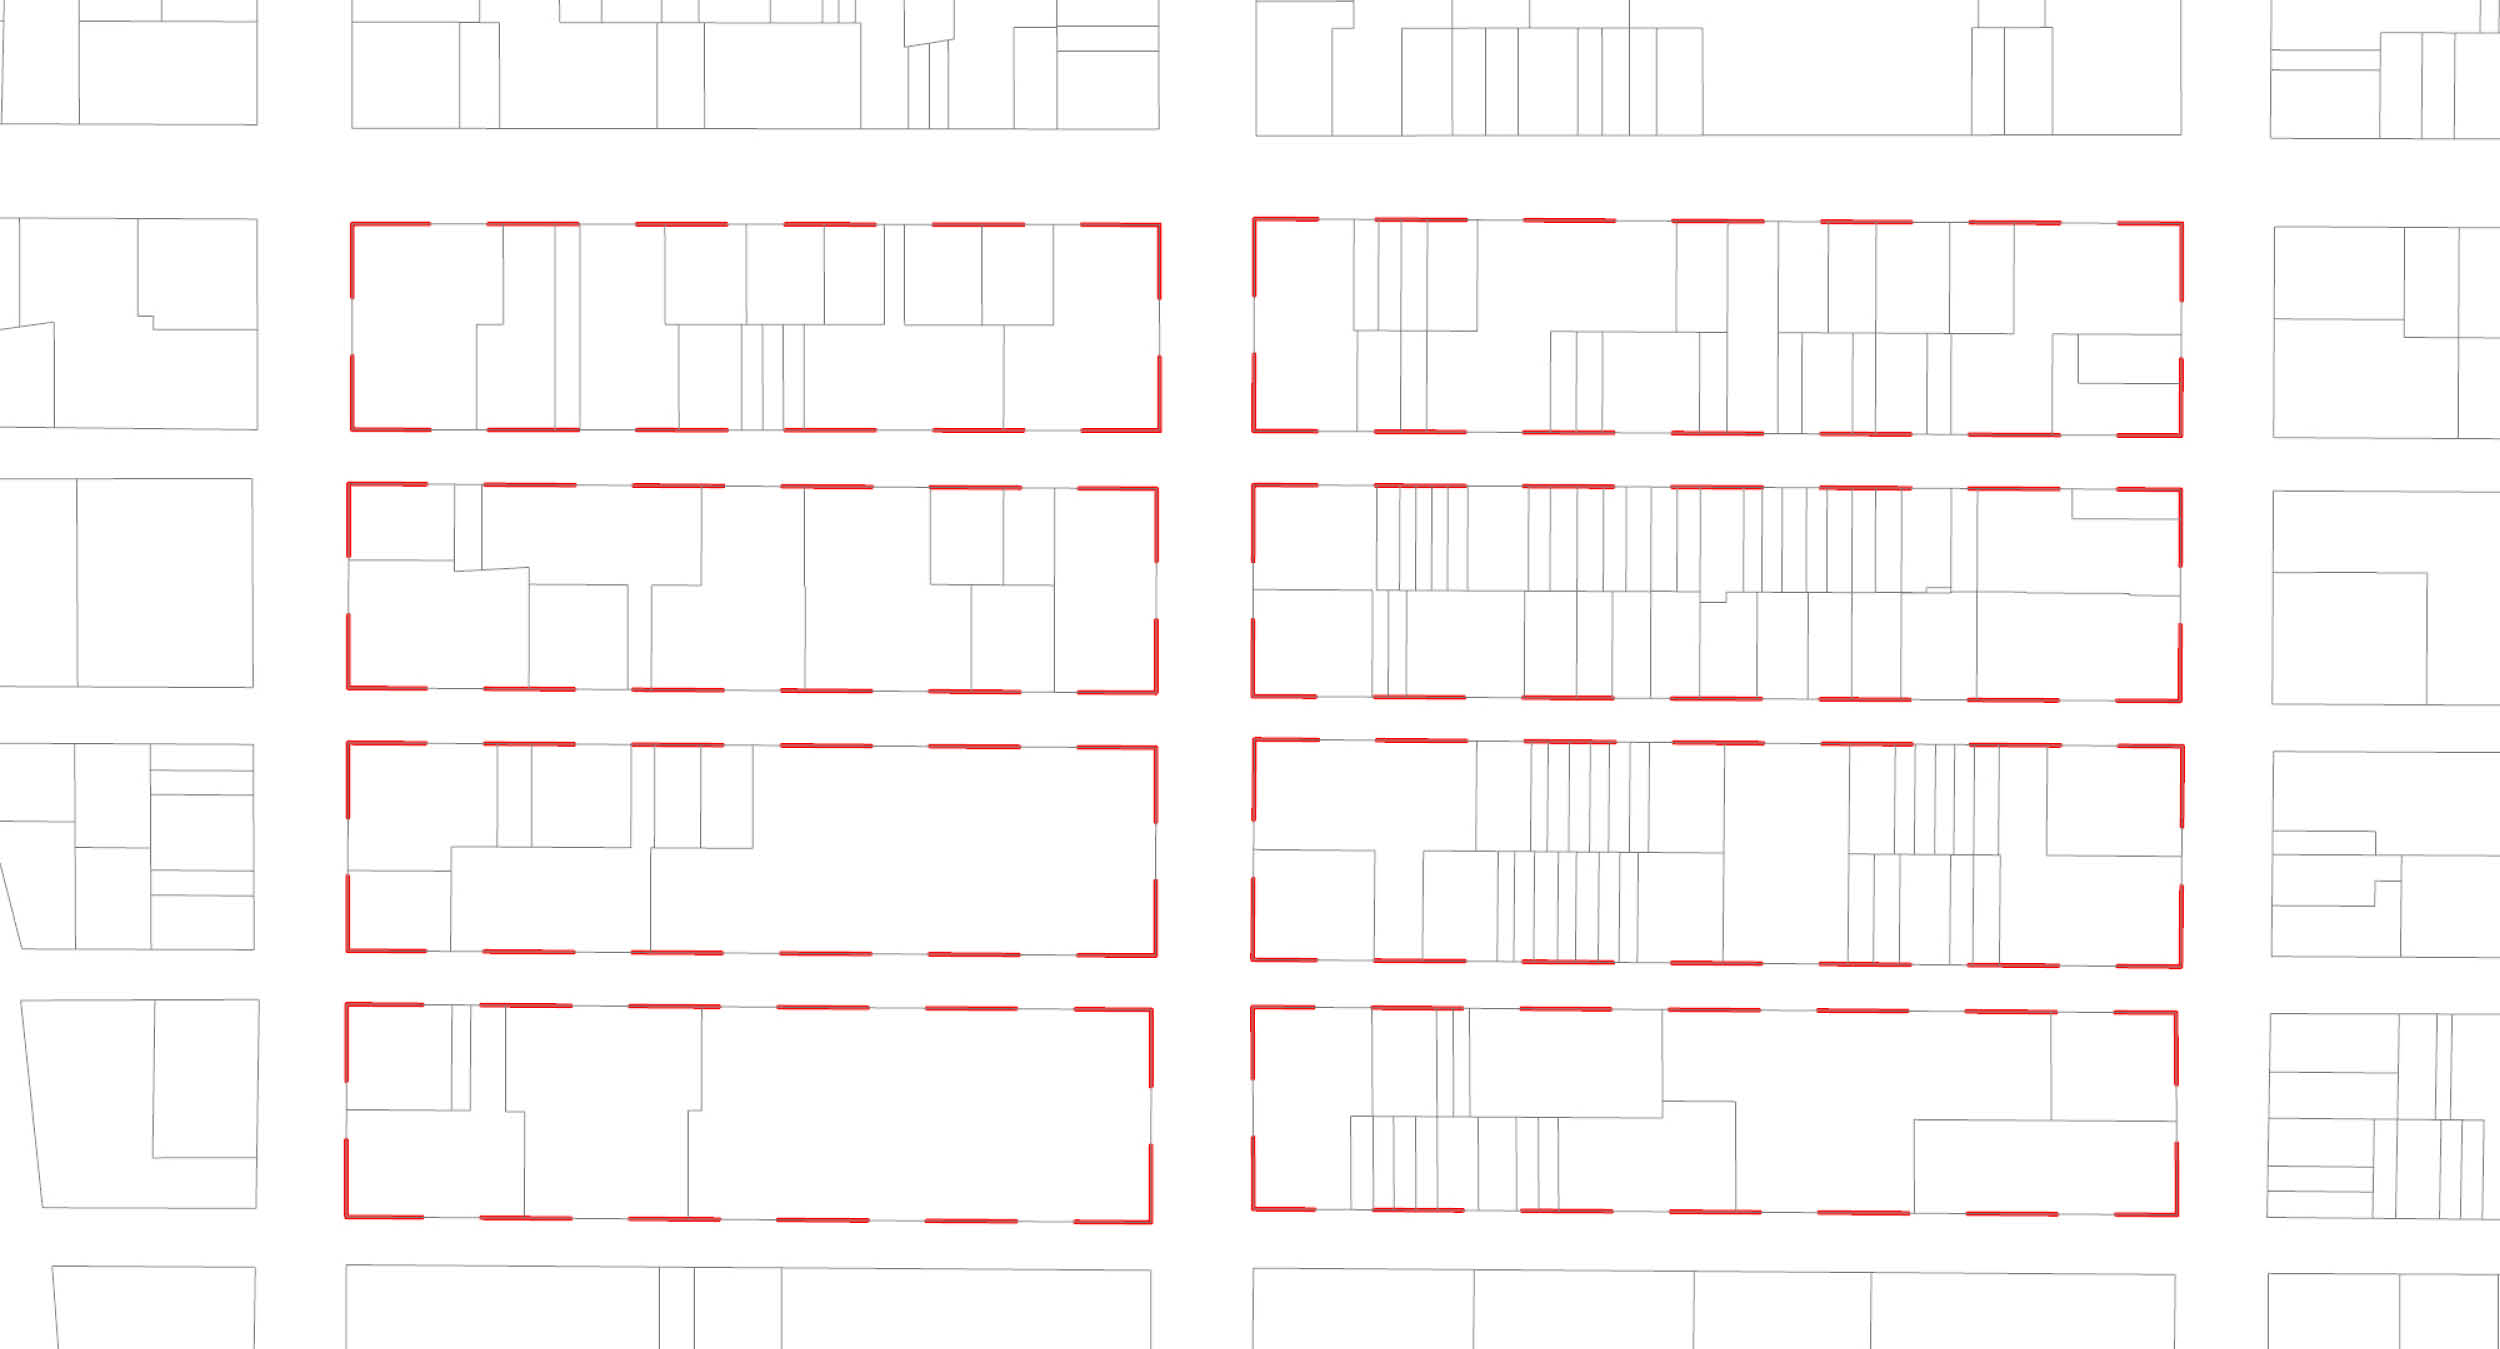 NYC: FAR = Gross Floor Area / Lot Area